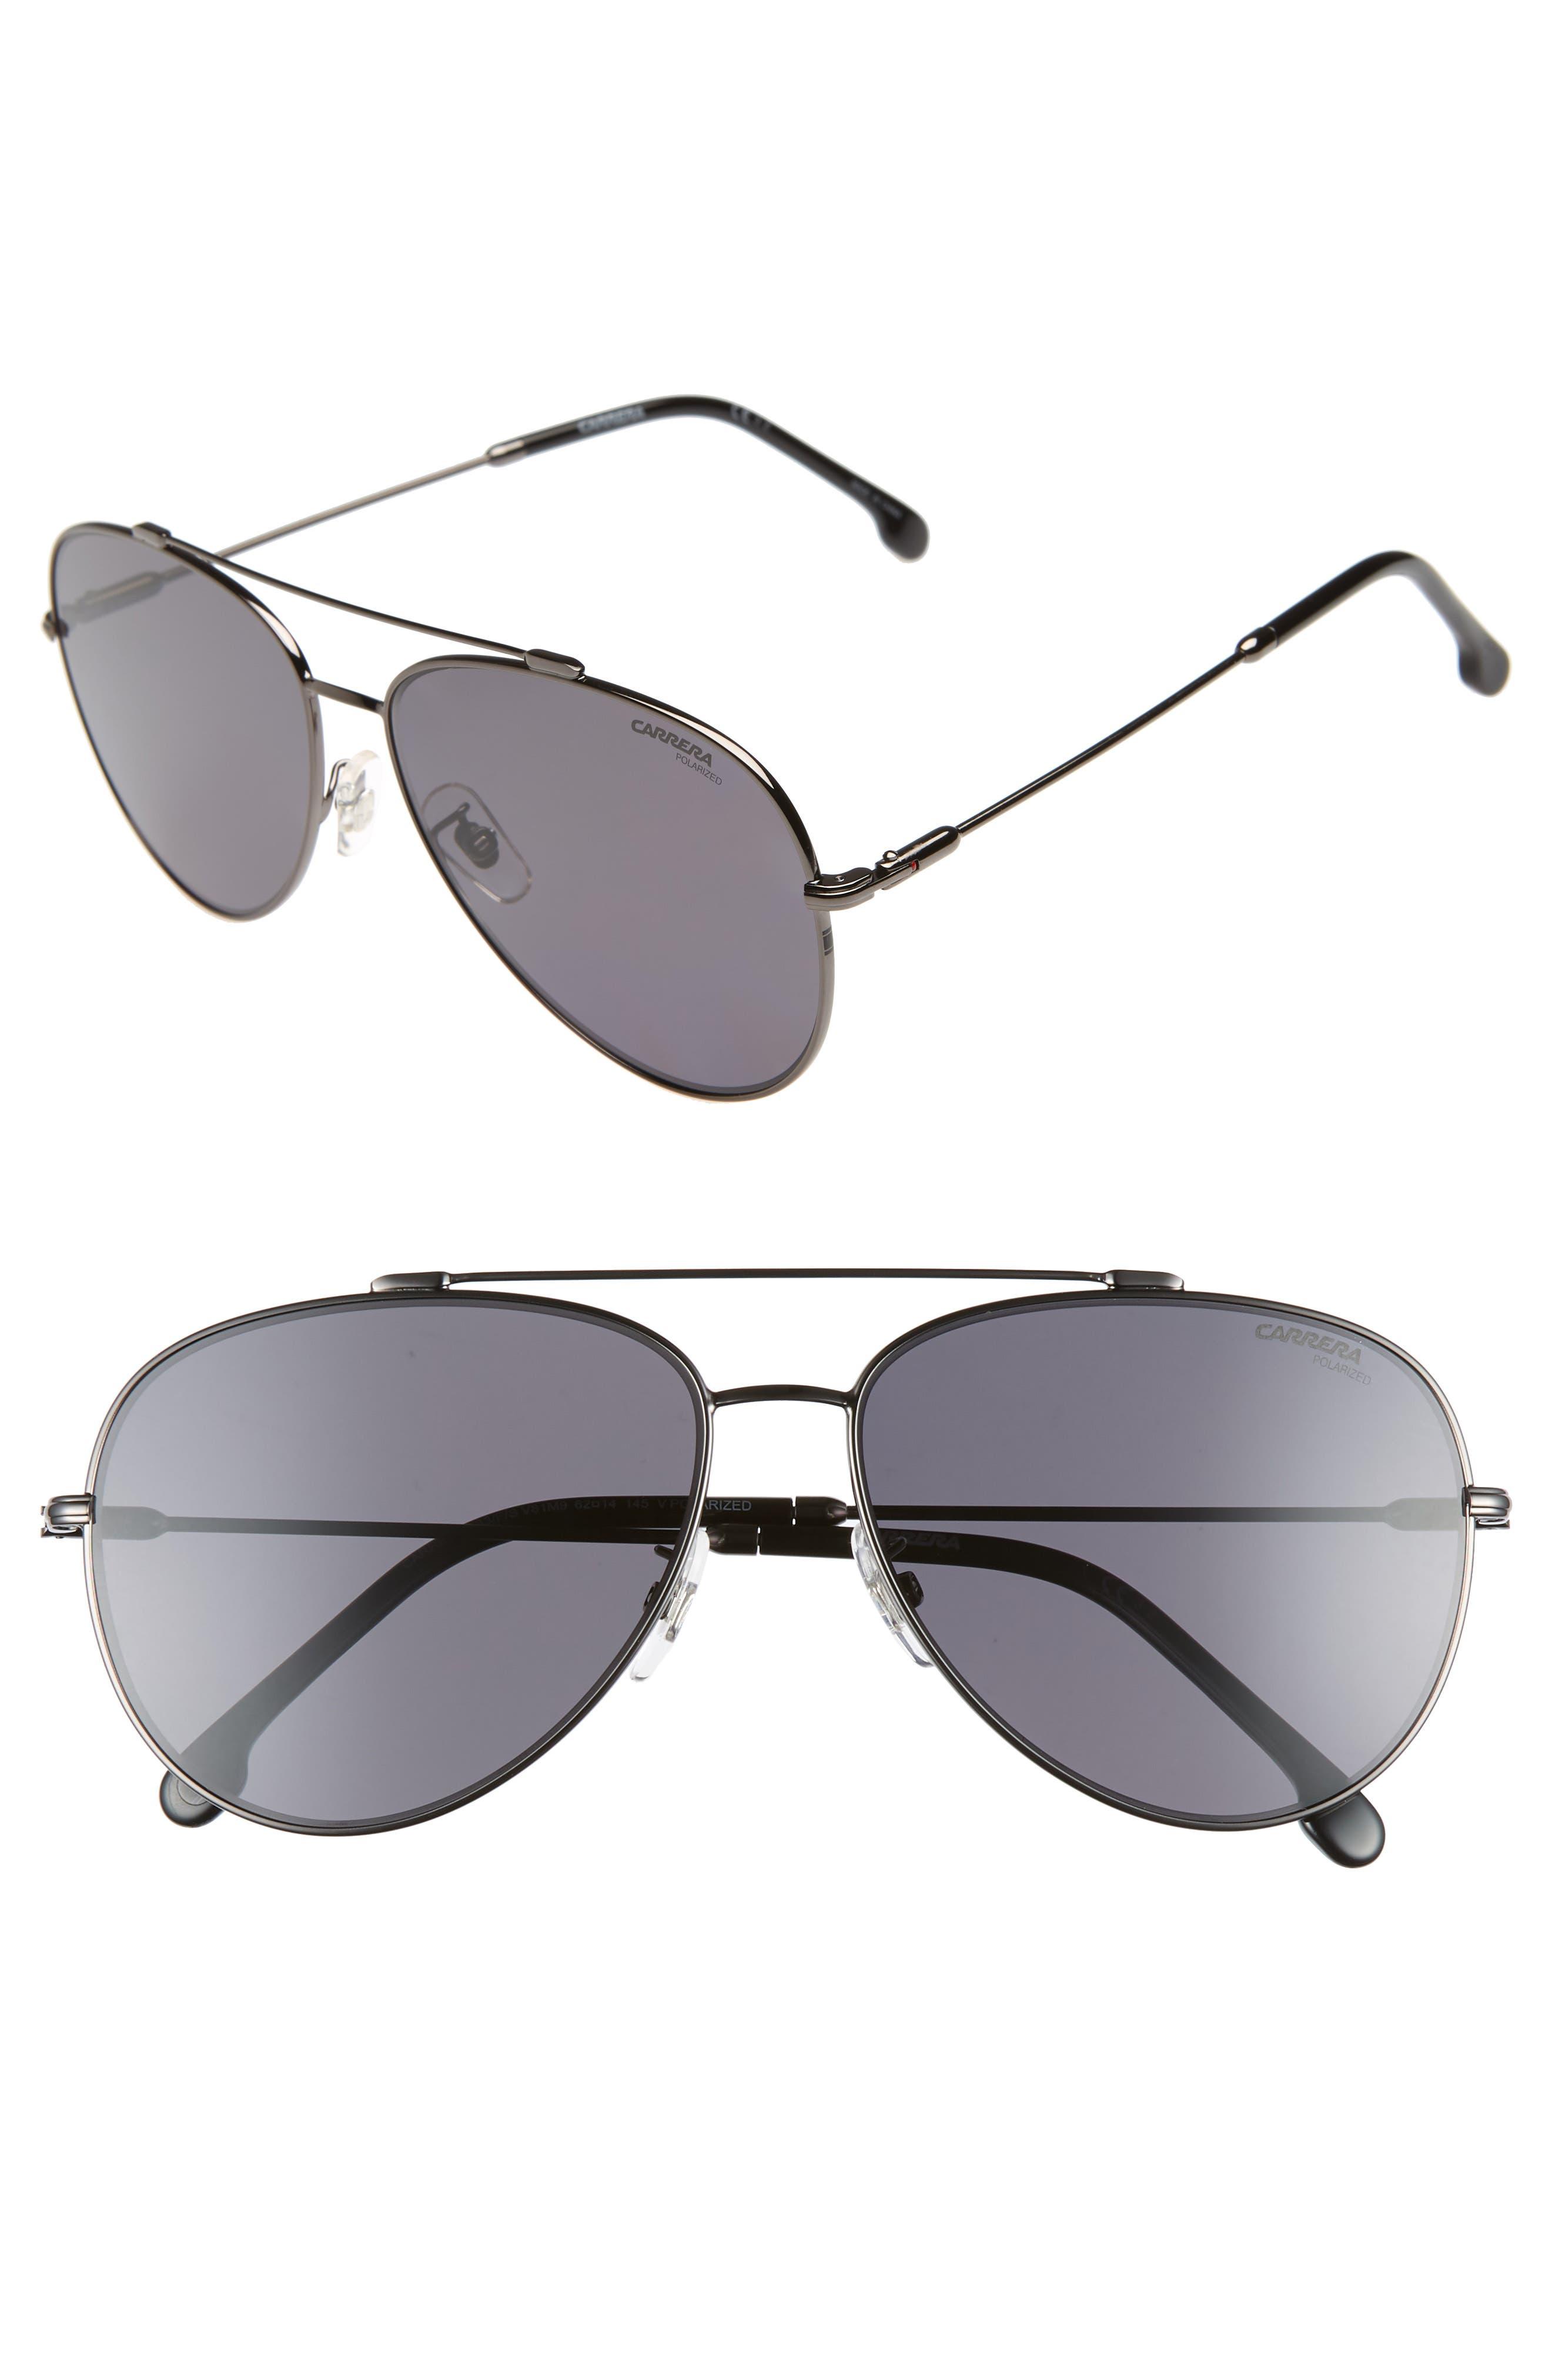 62mm Polarized Aviator Sunglasses,                         Main,                         color, DARK RUTHENIUM/ BLACK